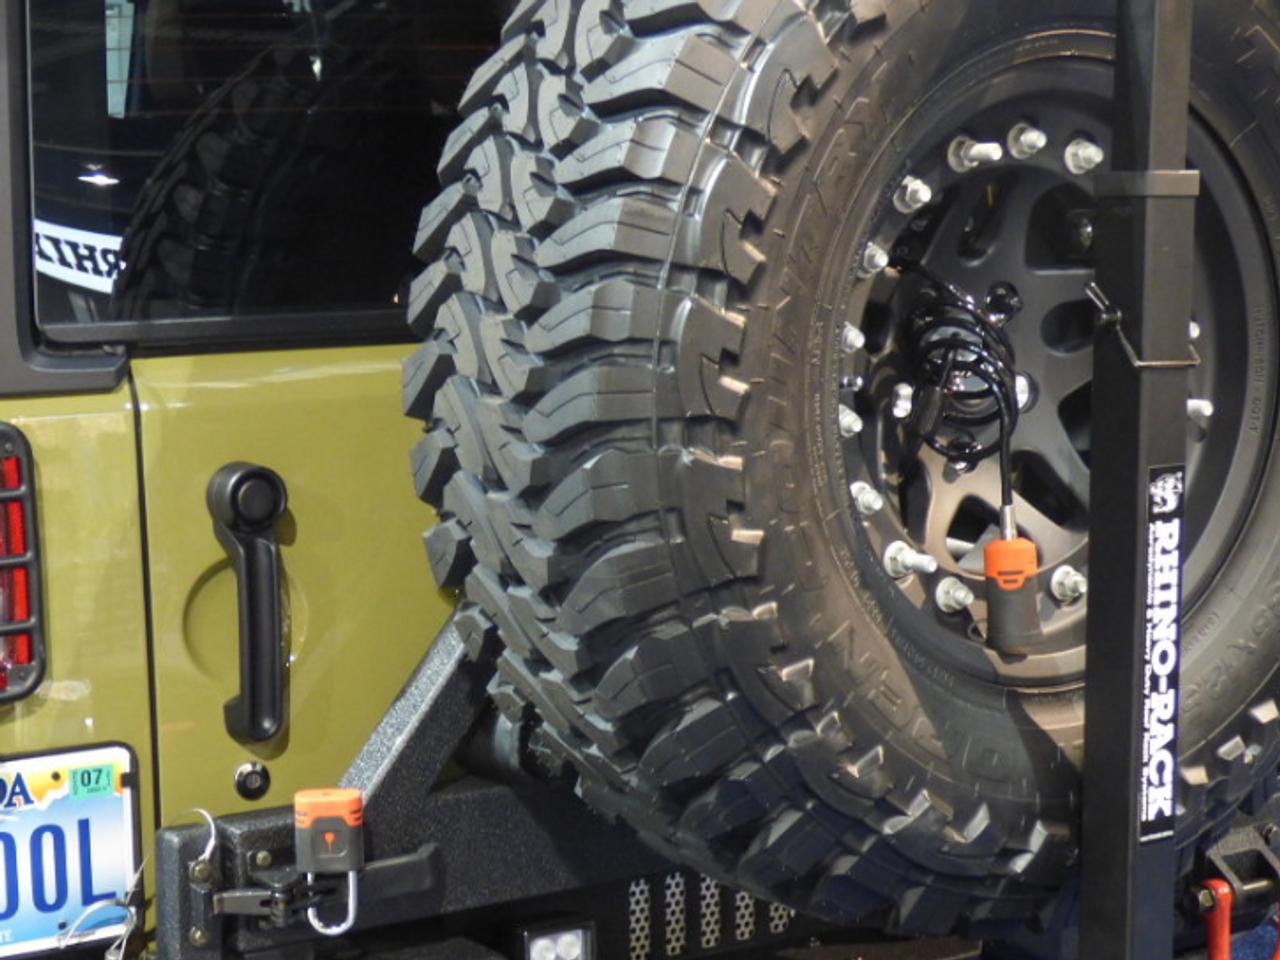 BOLT 7032295 6' Cable Lock for Jeep Wrangler JL & Gladiator JT 2018+